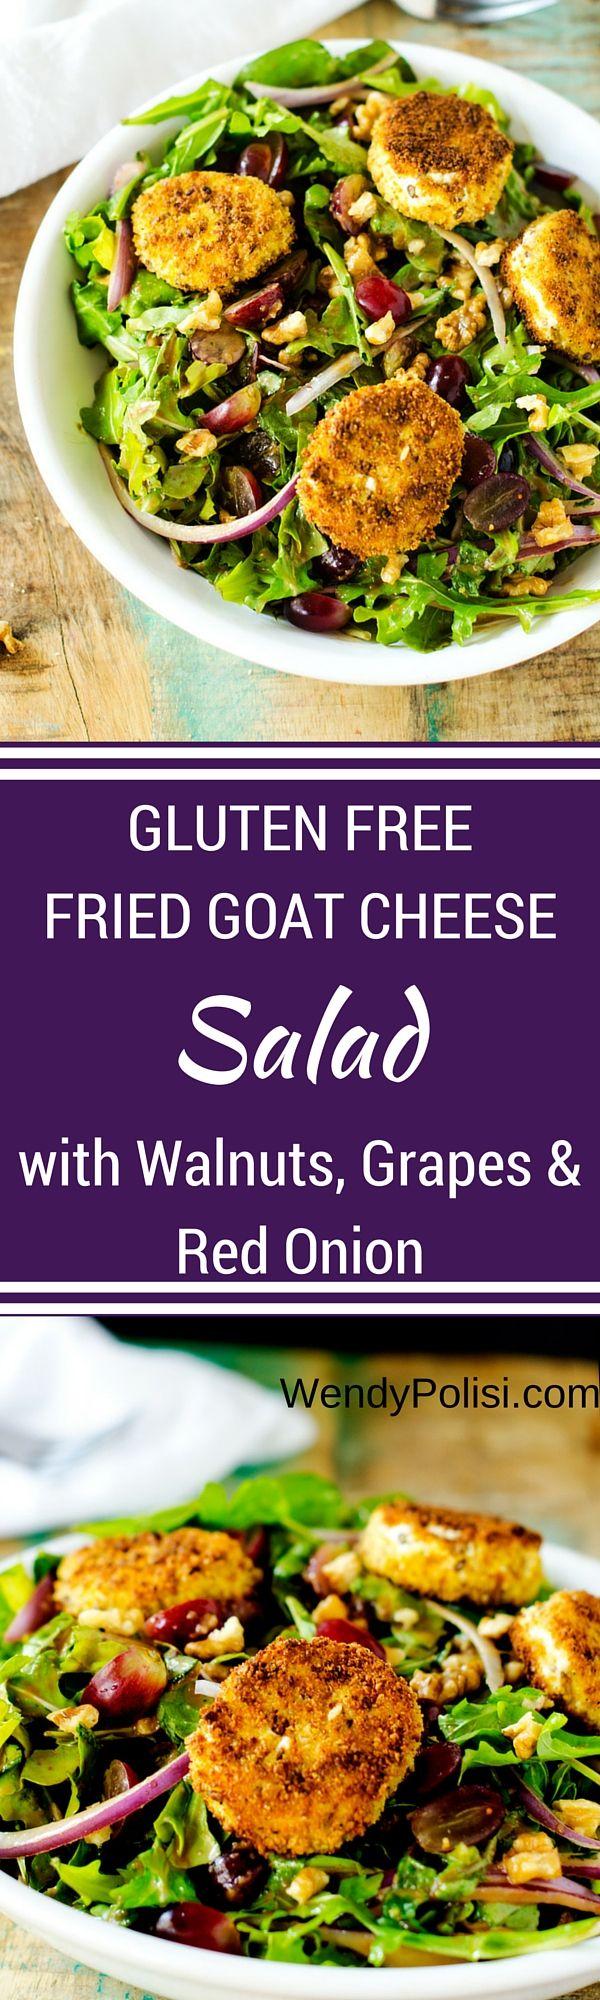 Gluten Free Fried Goat Cheese Salad